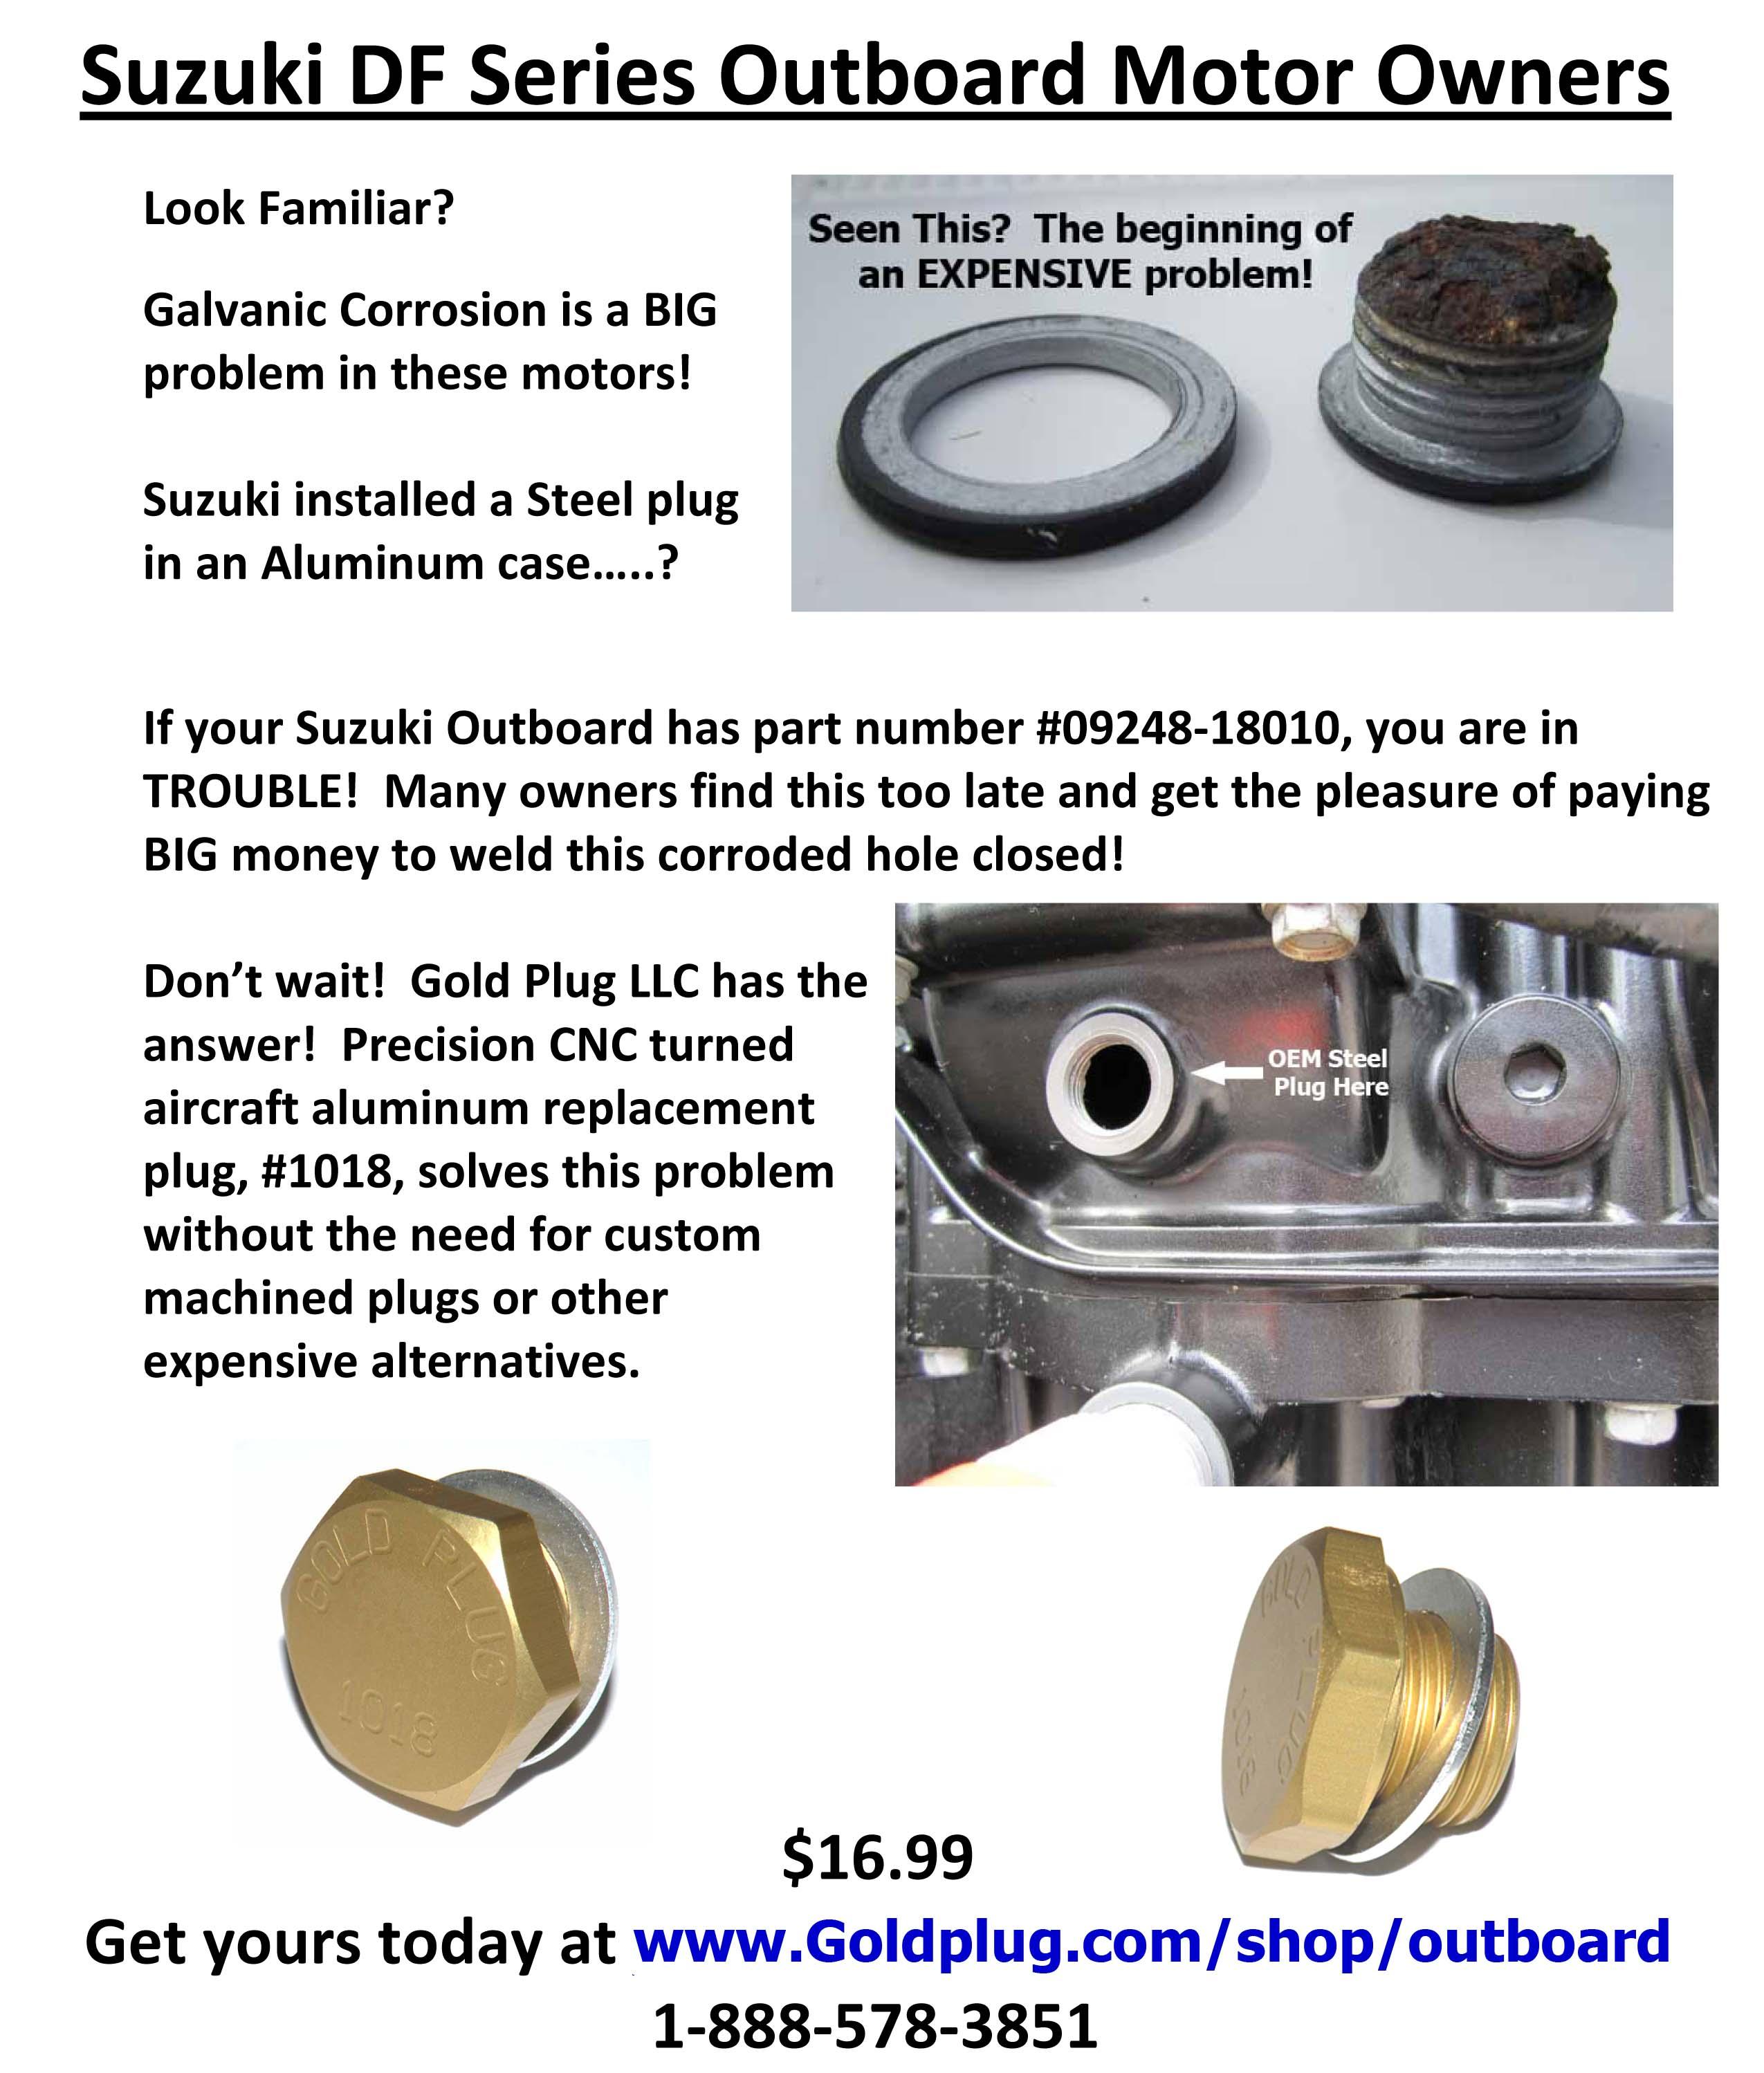 Suzuki outboard exhaust plug aluminum gold plug llc for Suzuki outboard motor repair shops